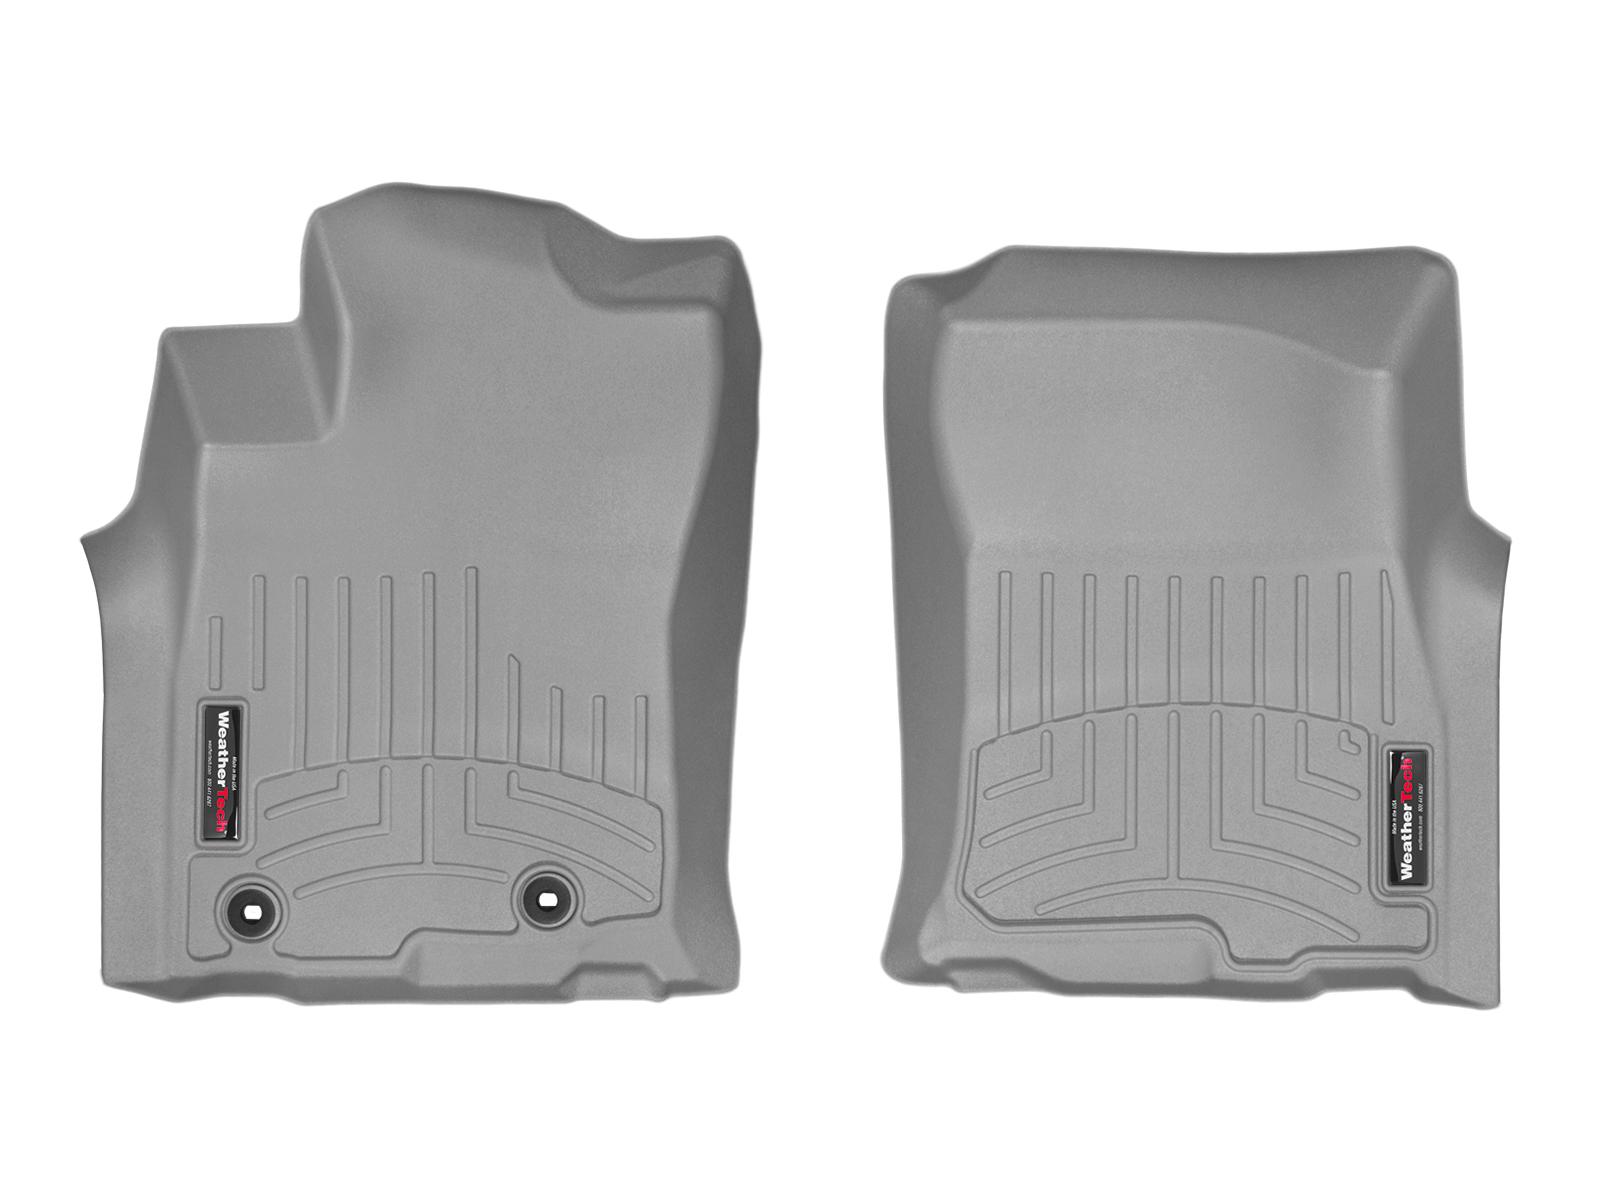 Tappeti gomma su misura bordo alto Toyota Prado 14>14 Grigio A3717*